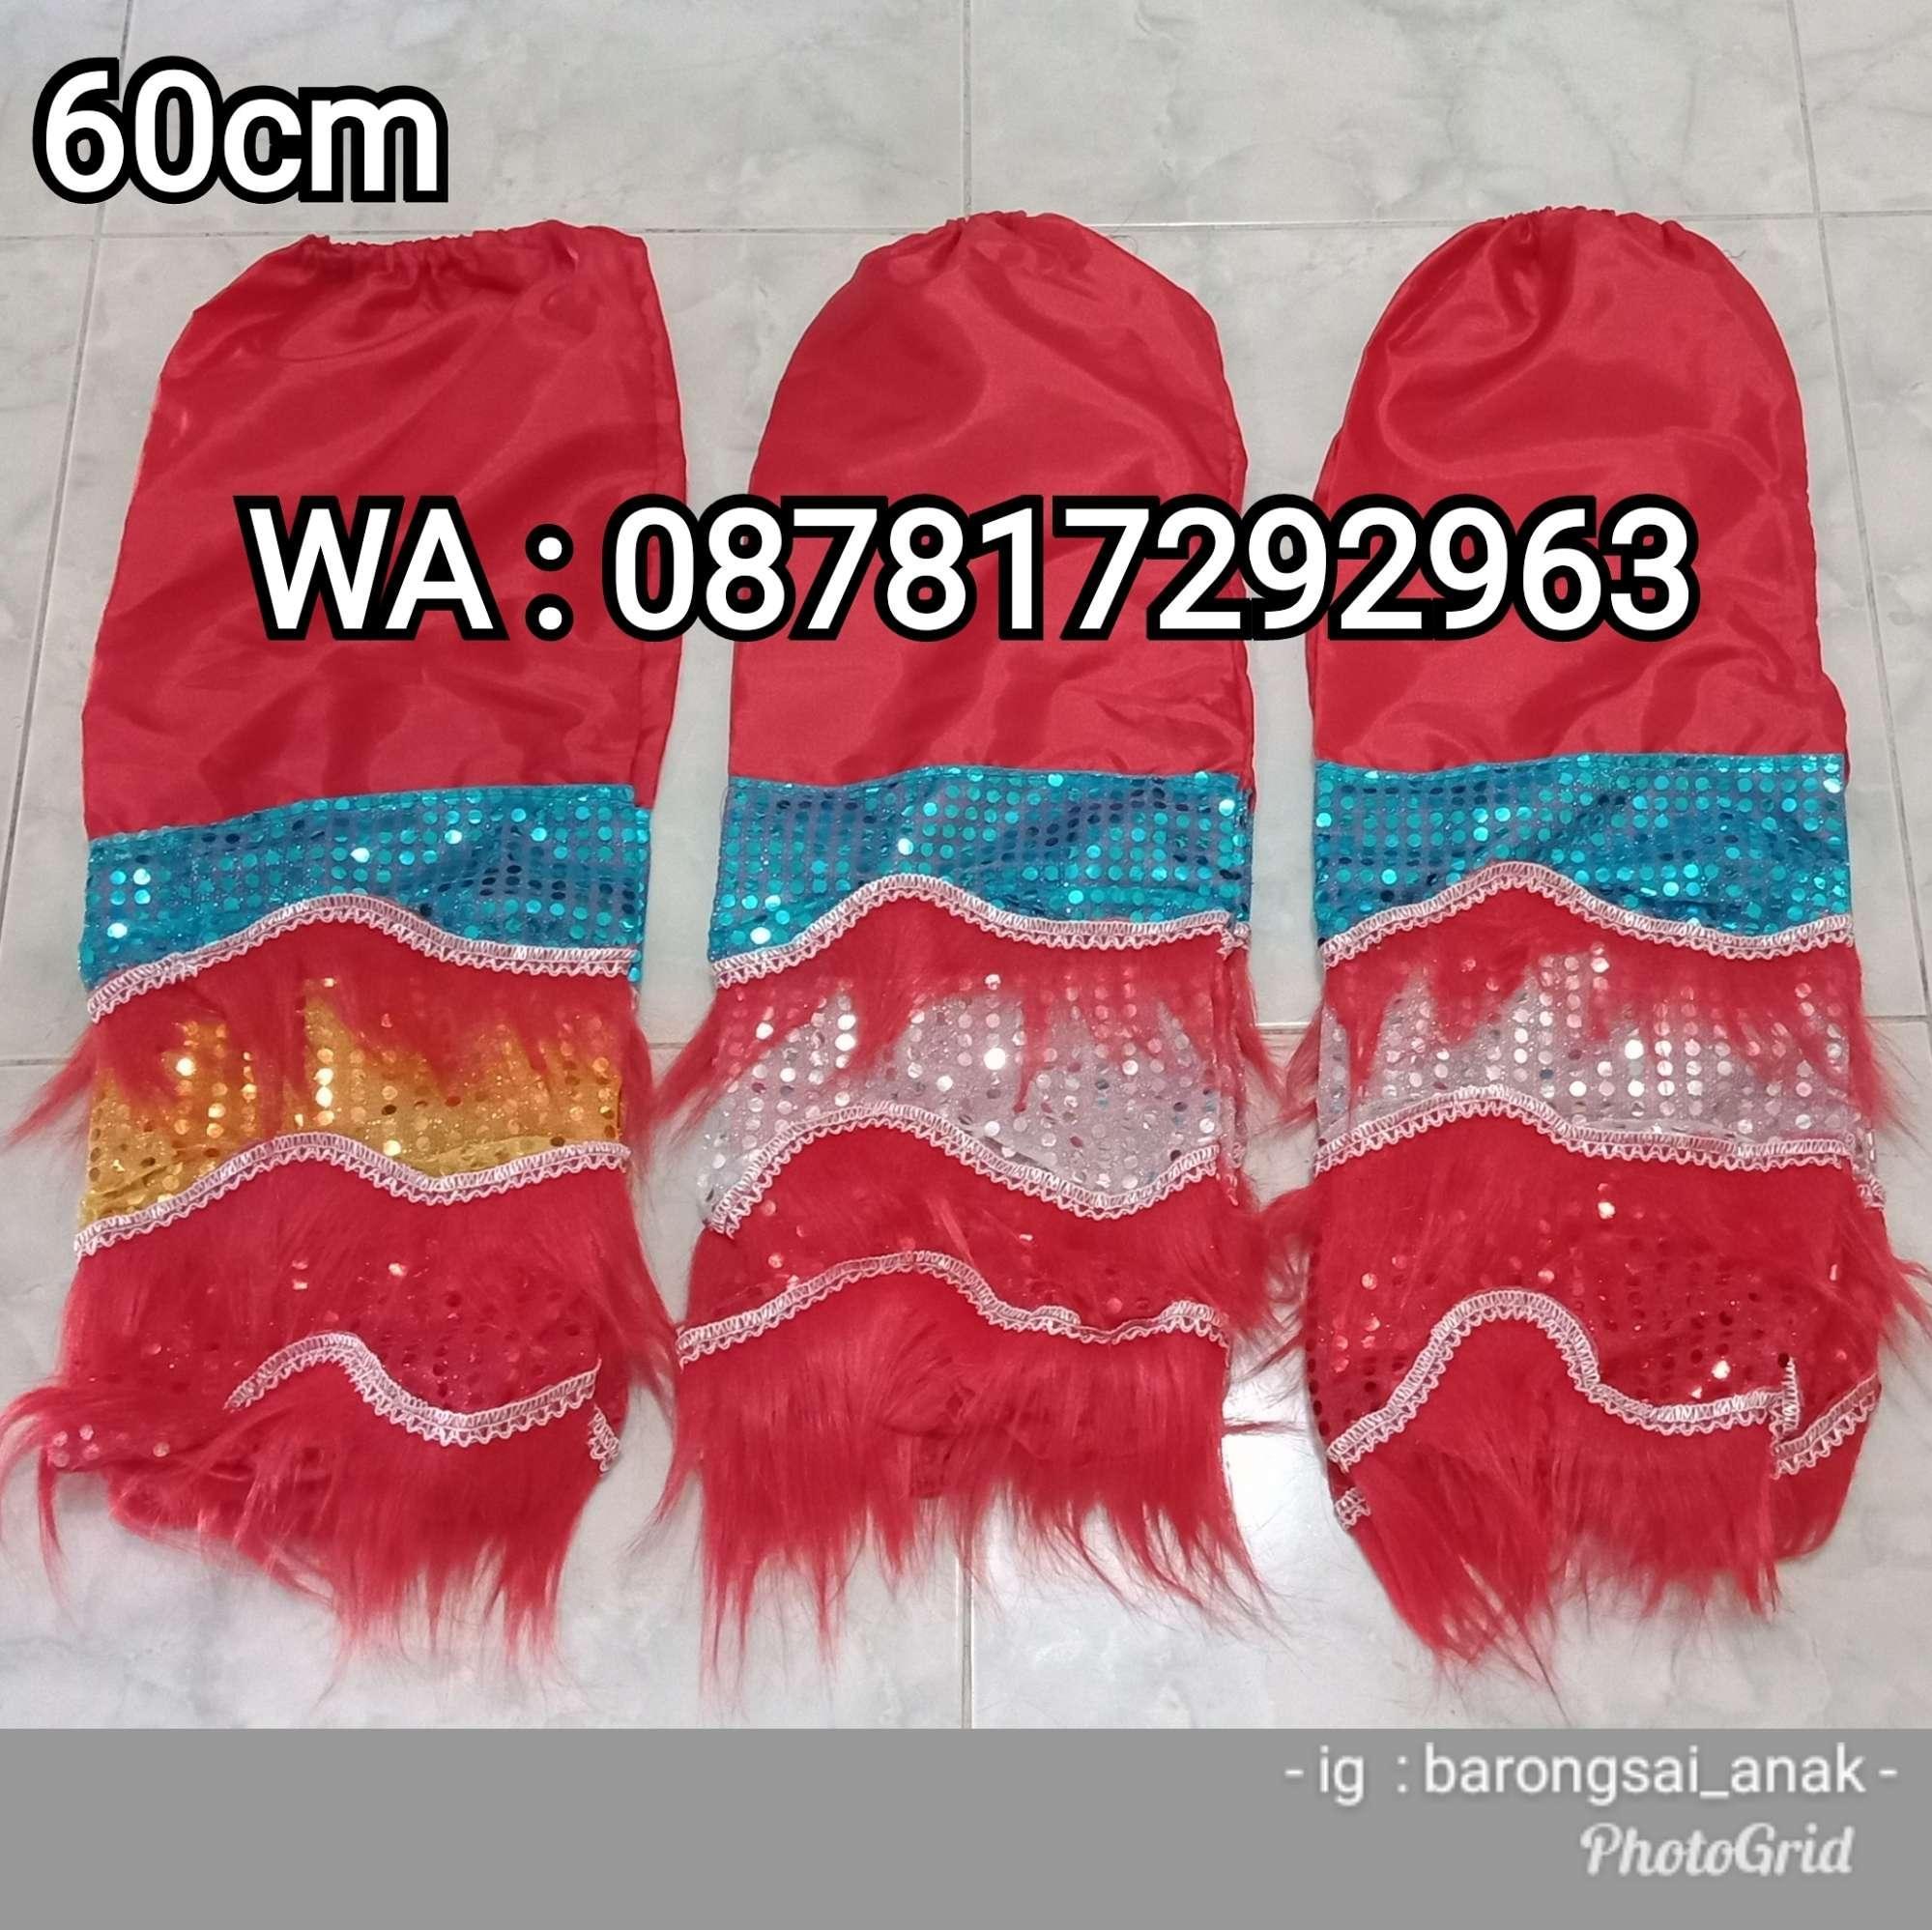 Celana Barongsai Anak bulu warna Merah panjang 60cm